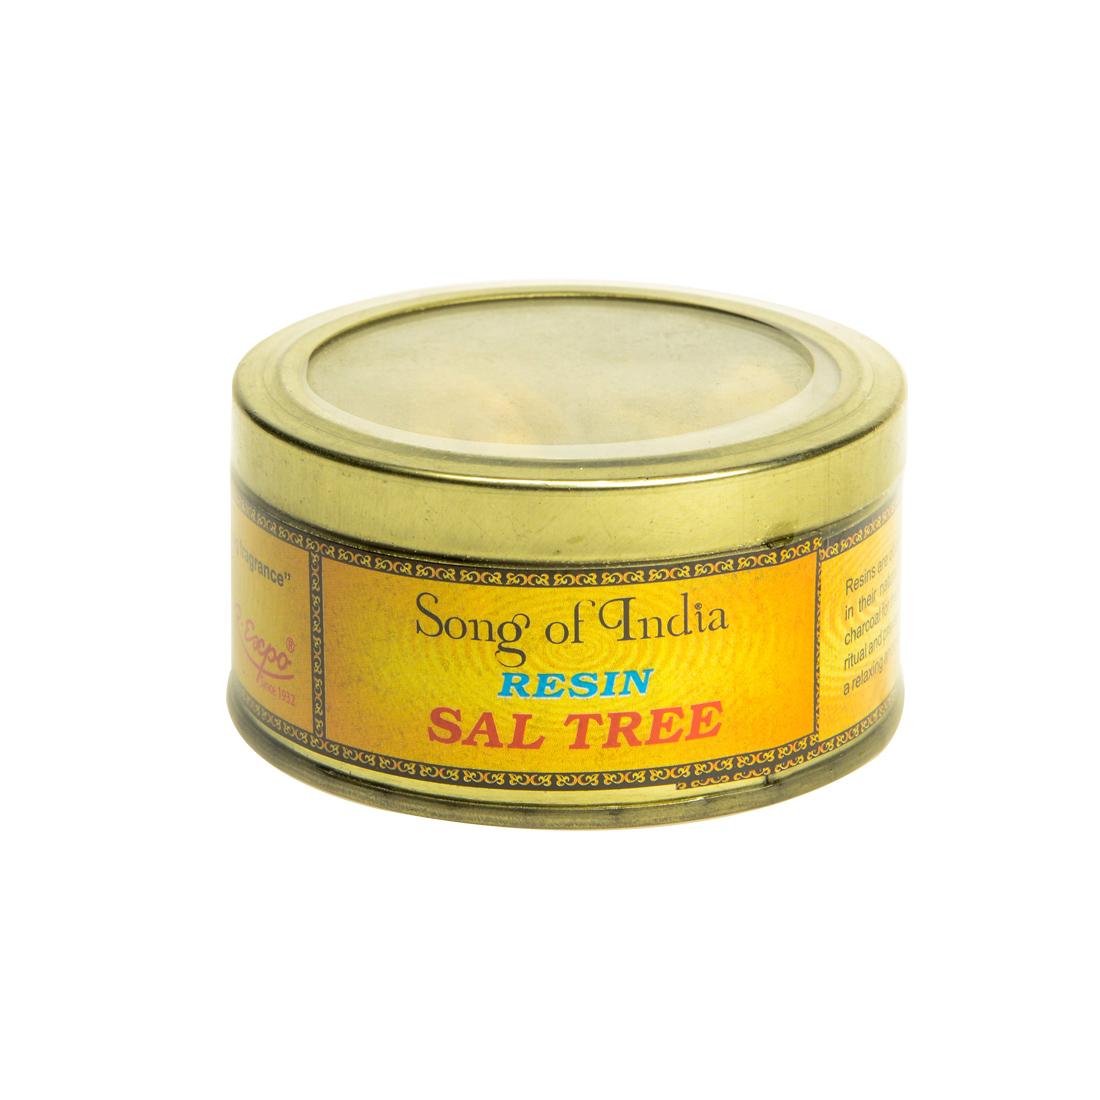 Encen resine sal tree